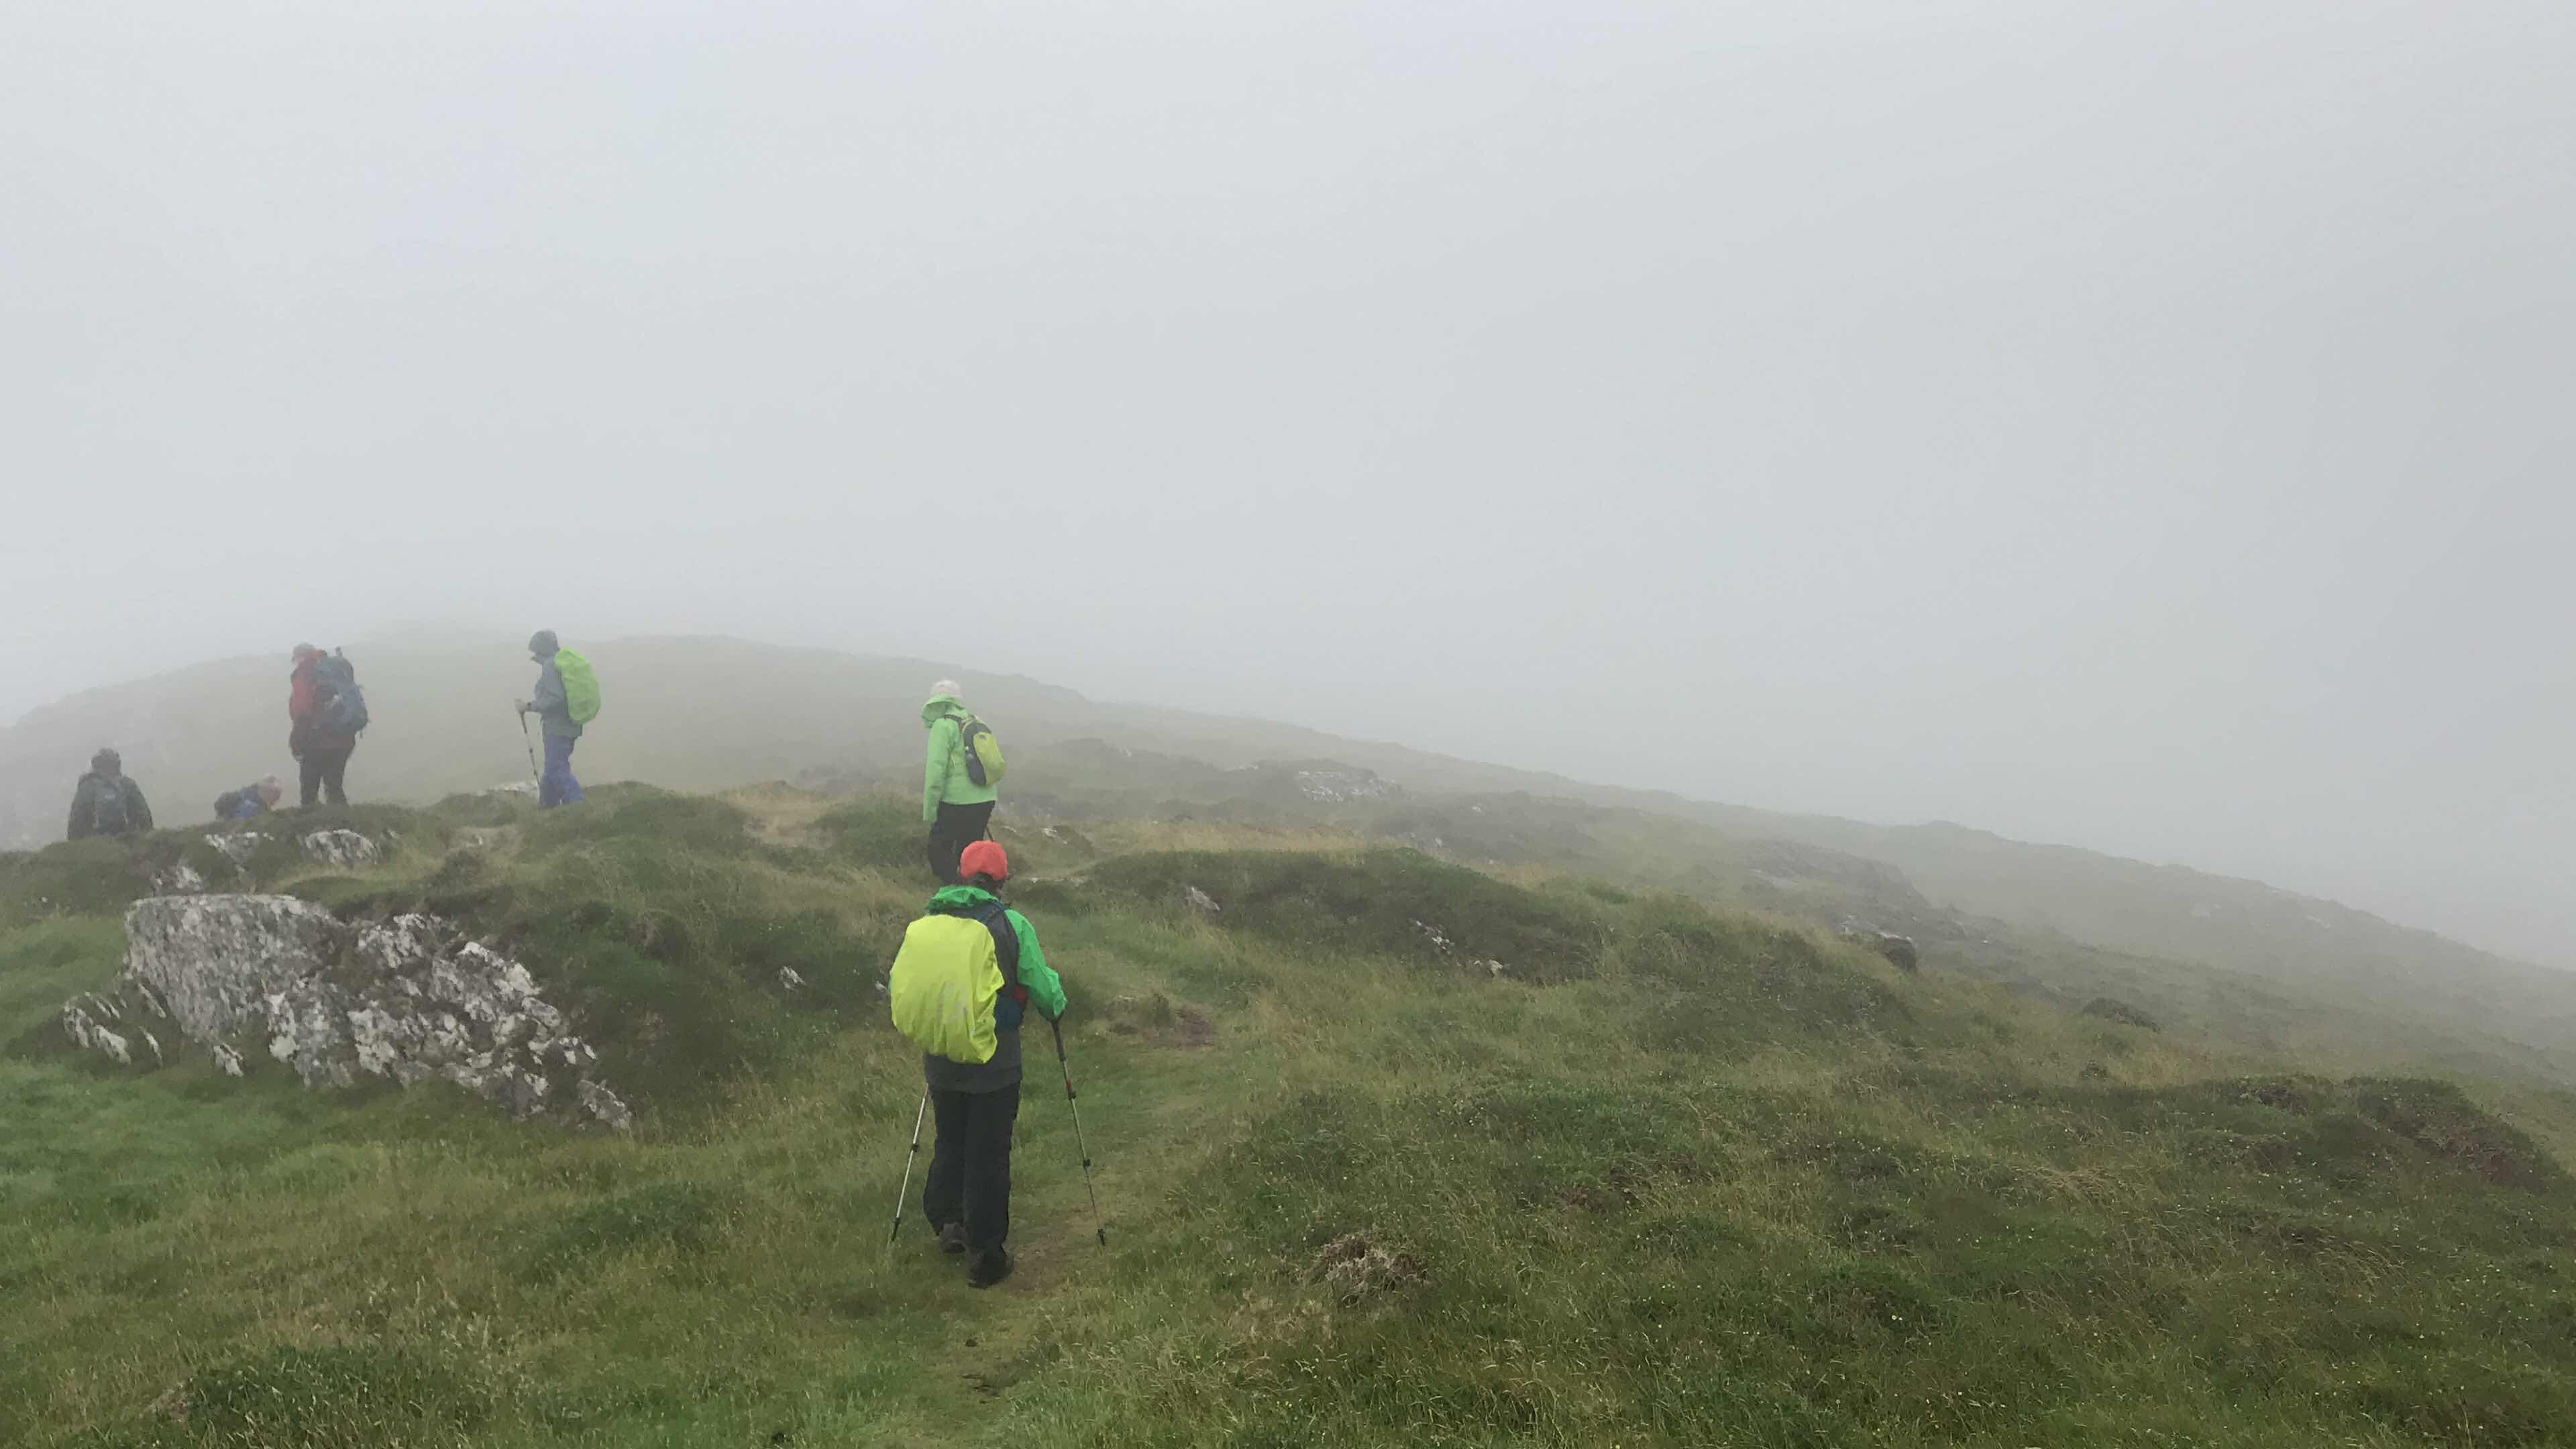 hilltops in mist